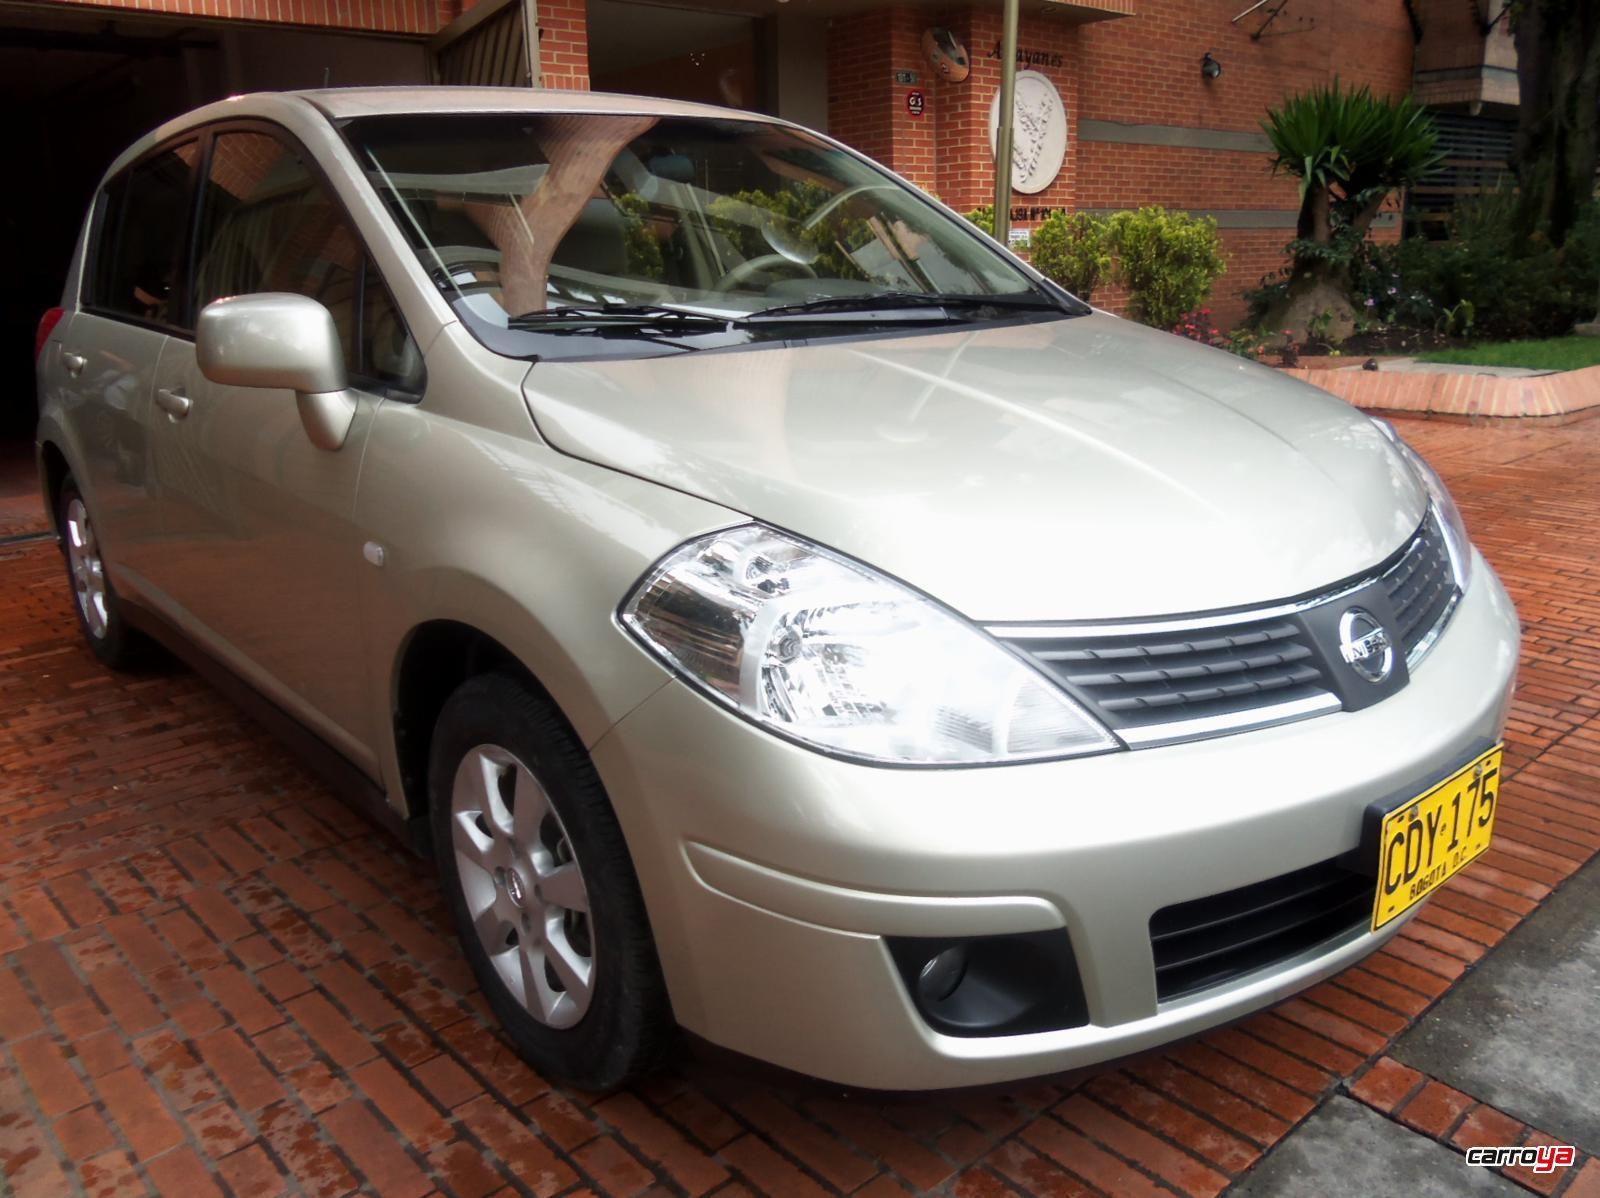 Nissan Tiida 1.8 Emotion Hatchback Mecánico Full Equipo 2007 usado en ...